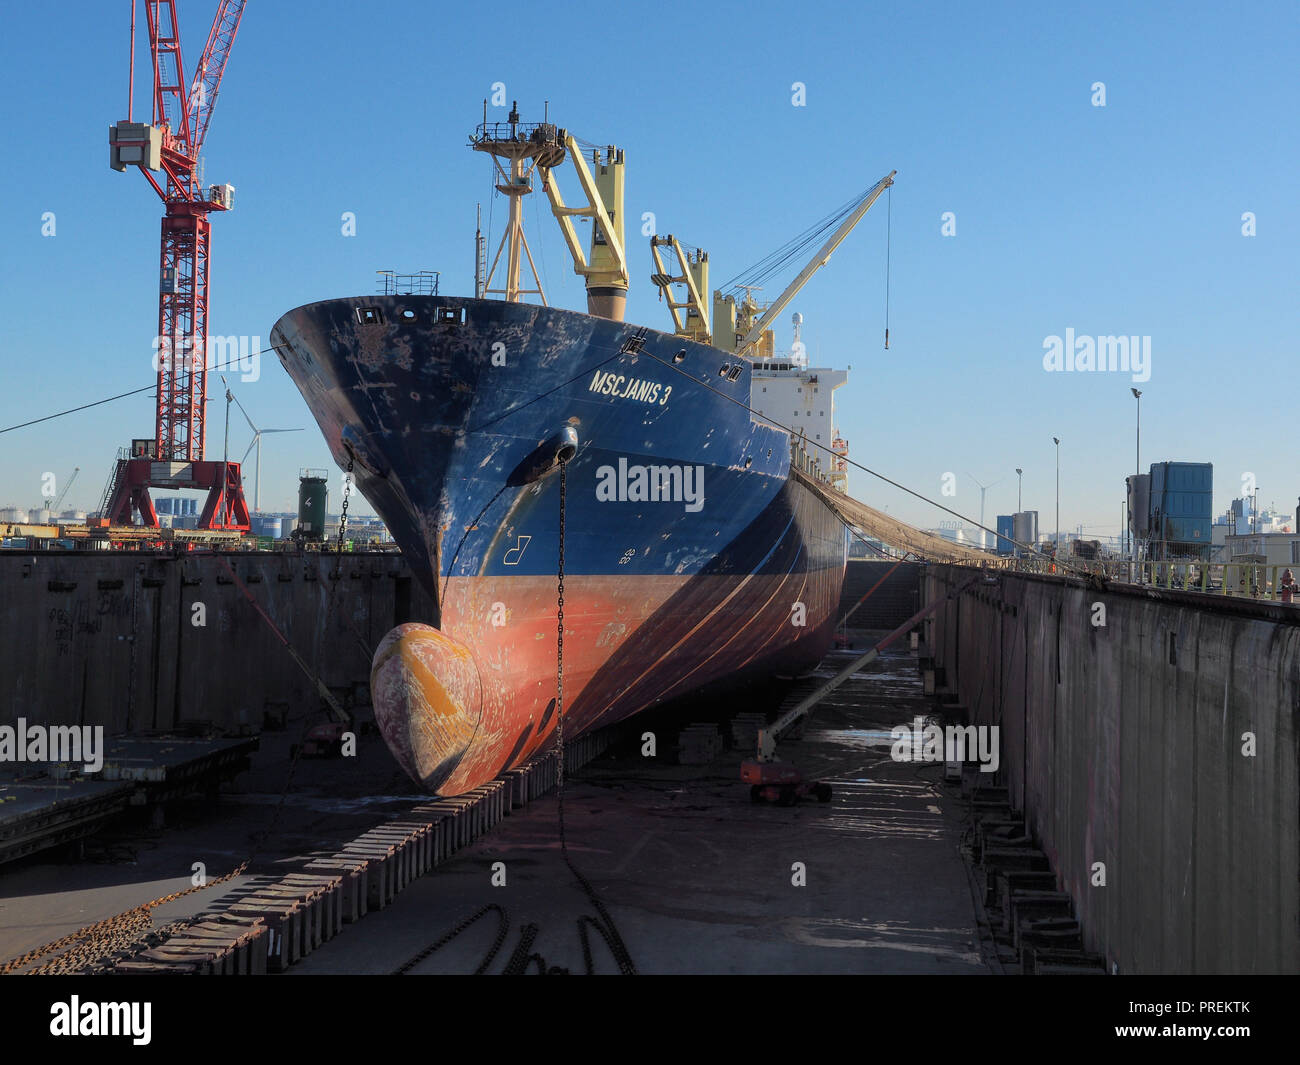 Cargo ship in dry dock for maintenance in the port of Antwerp, Belgium - Stock Image